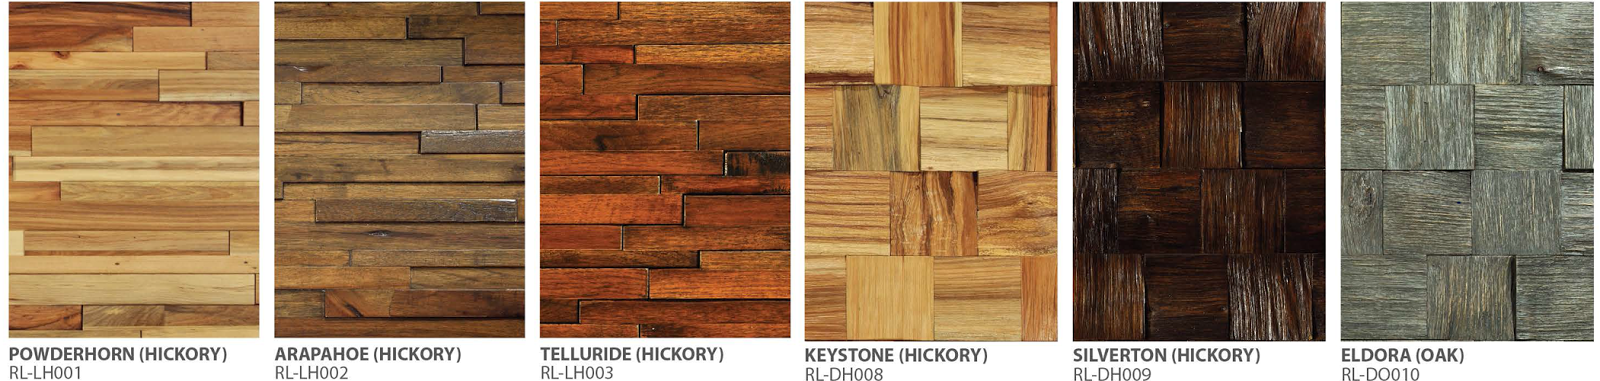 Hardwood Wall Coverings Isc Surfaces Johnson Hardwood's Rowlock  Beautiful Wood Wall .